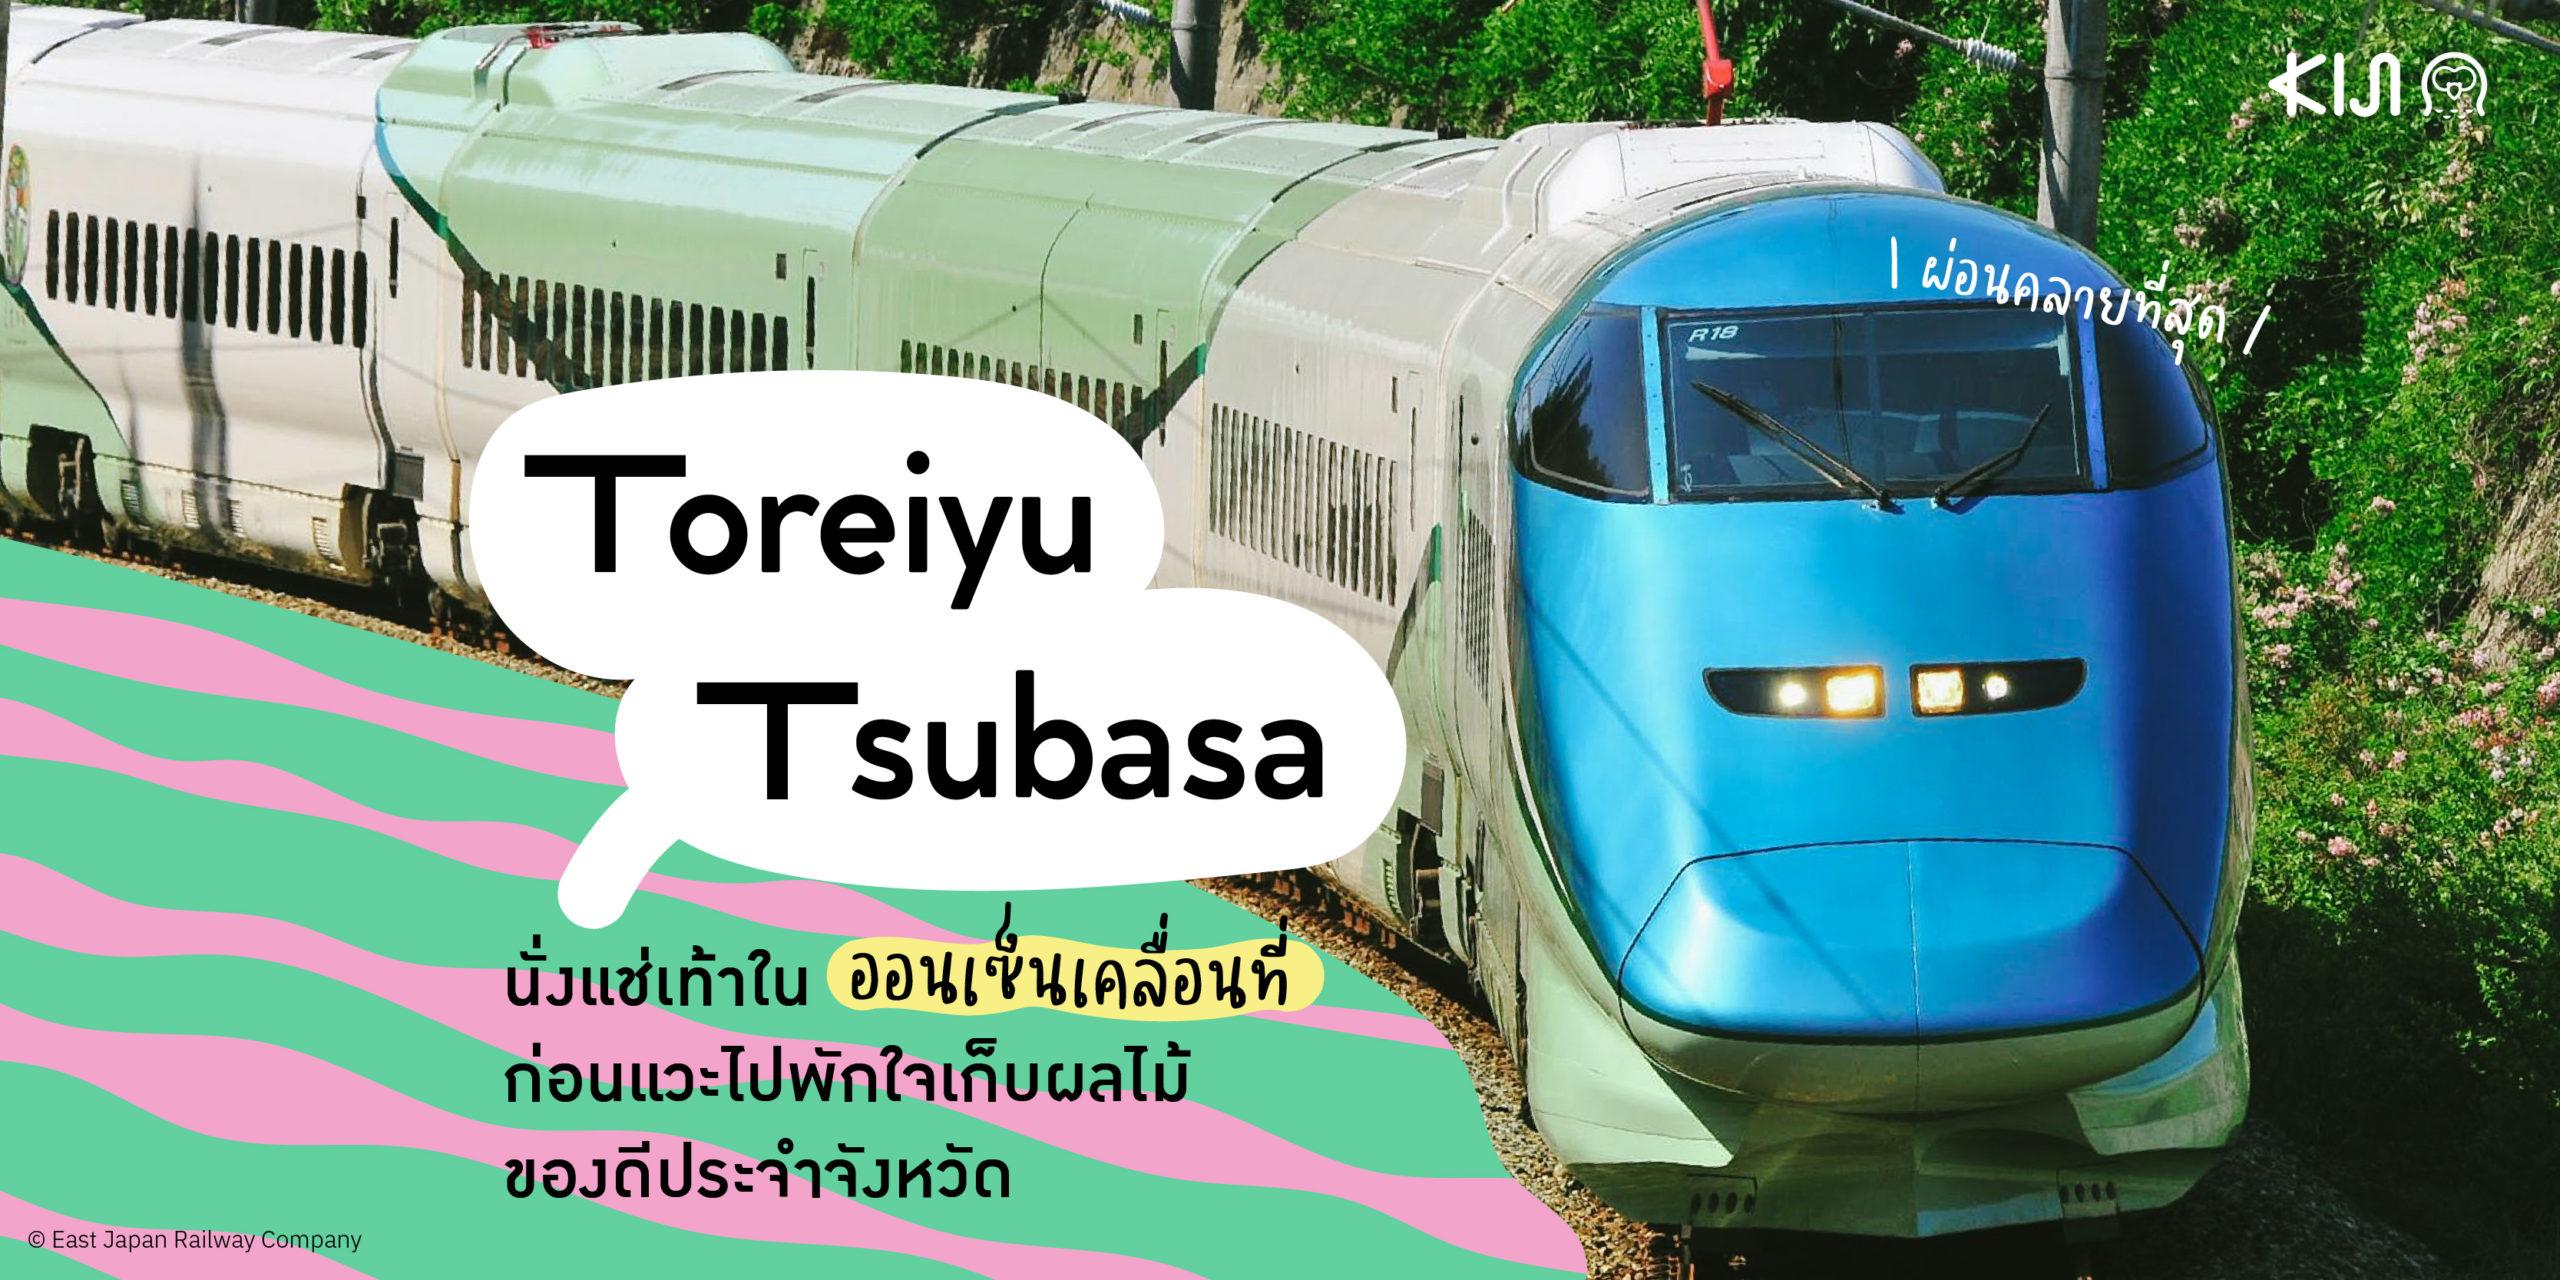 Toreiyu Tsubasa หนึ่งในสมาชิกของ Joyful Train ในญี่ปุ่น